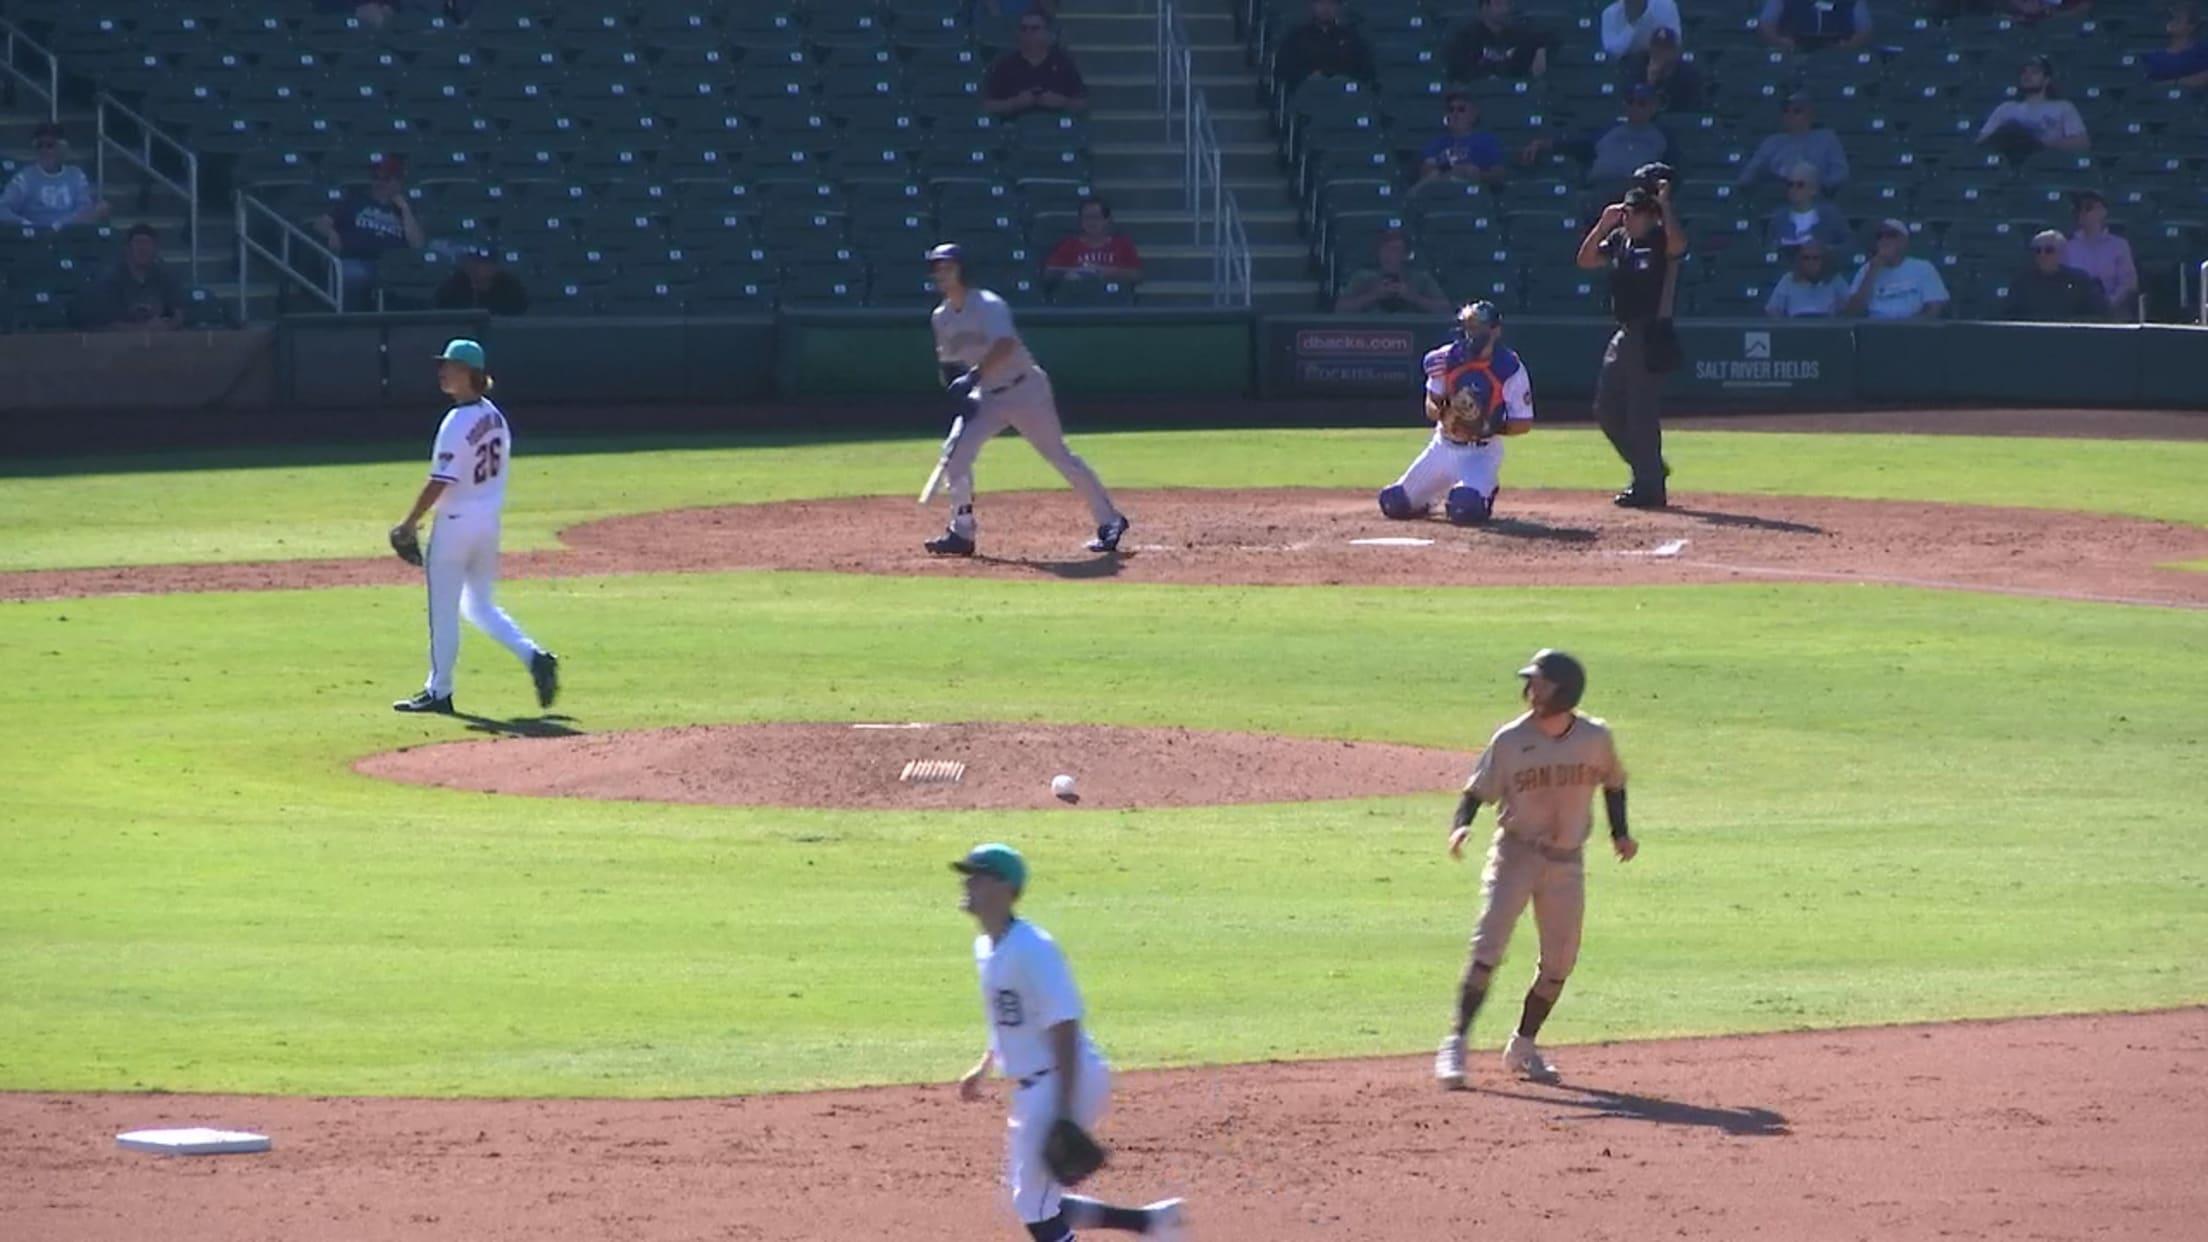 Zach DeLoach's three-run home run